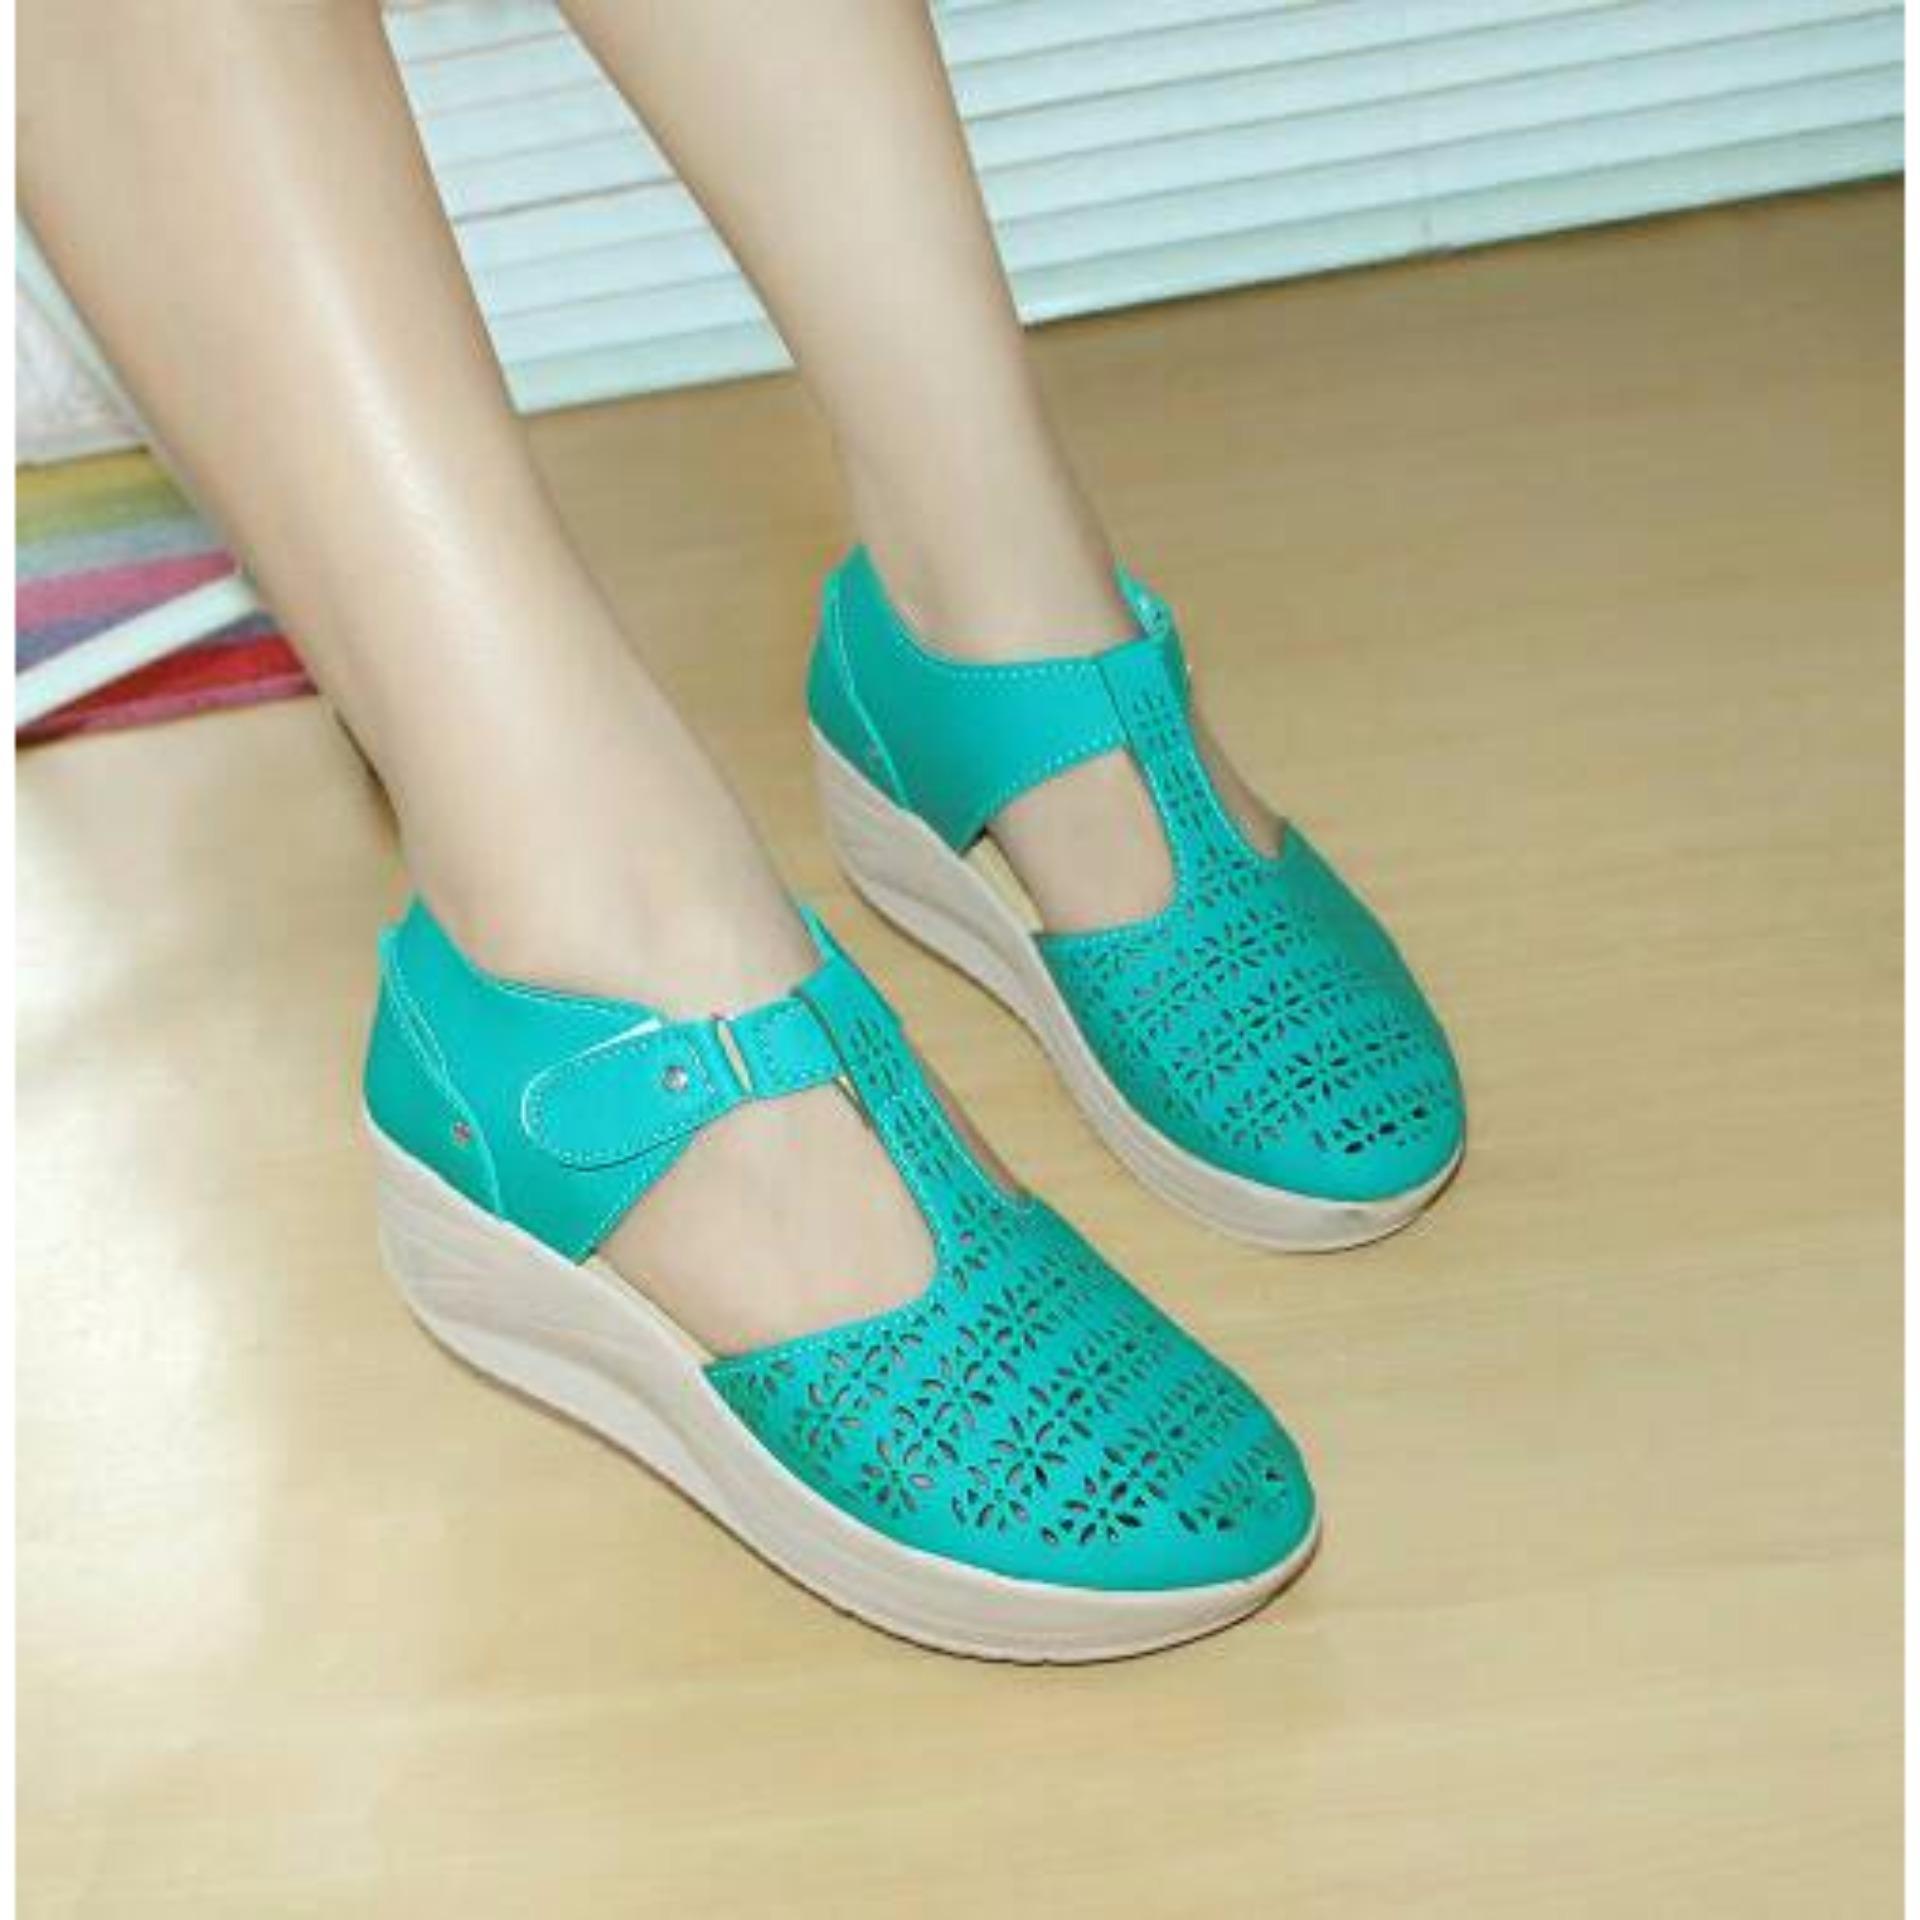 Sepatu Wanita Murah Wedges Laser Sintetis Tosca Nfz 804 Promo Beli 1 Gratis 1